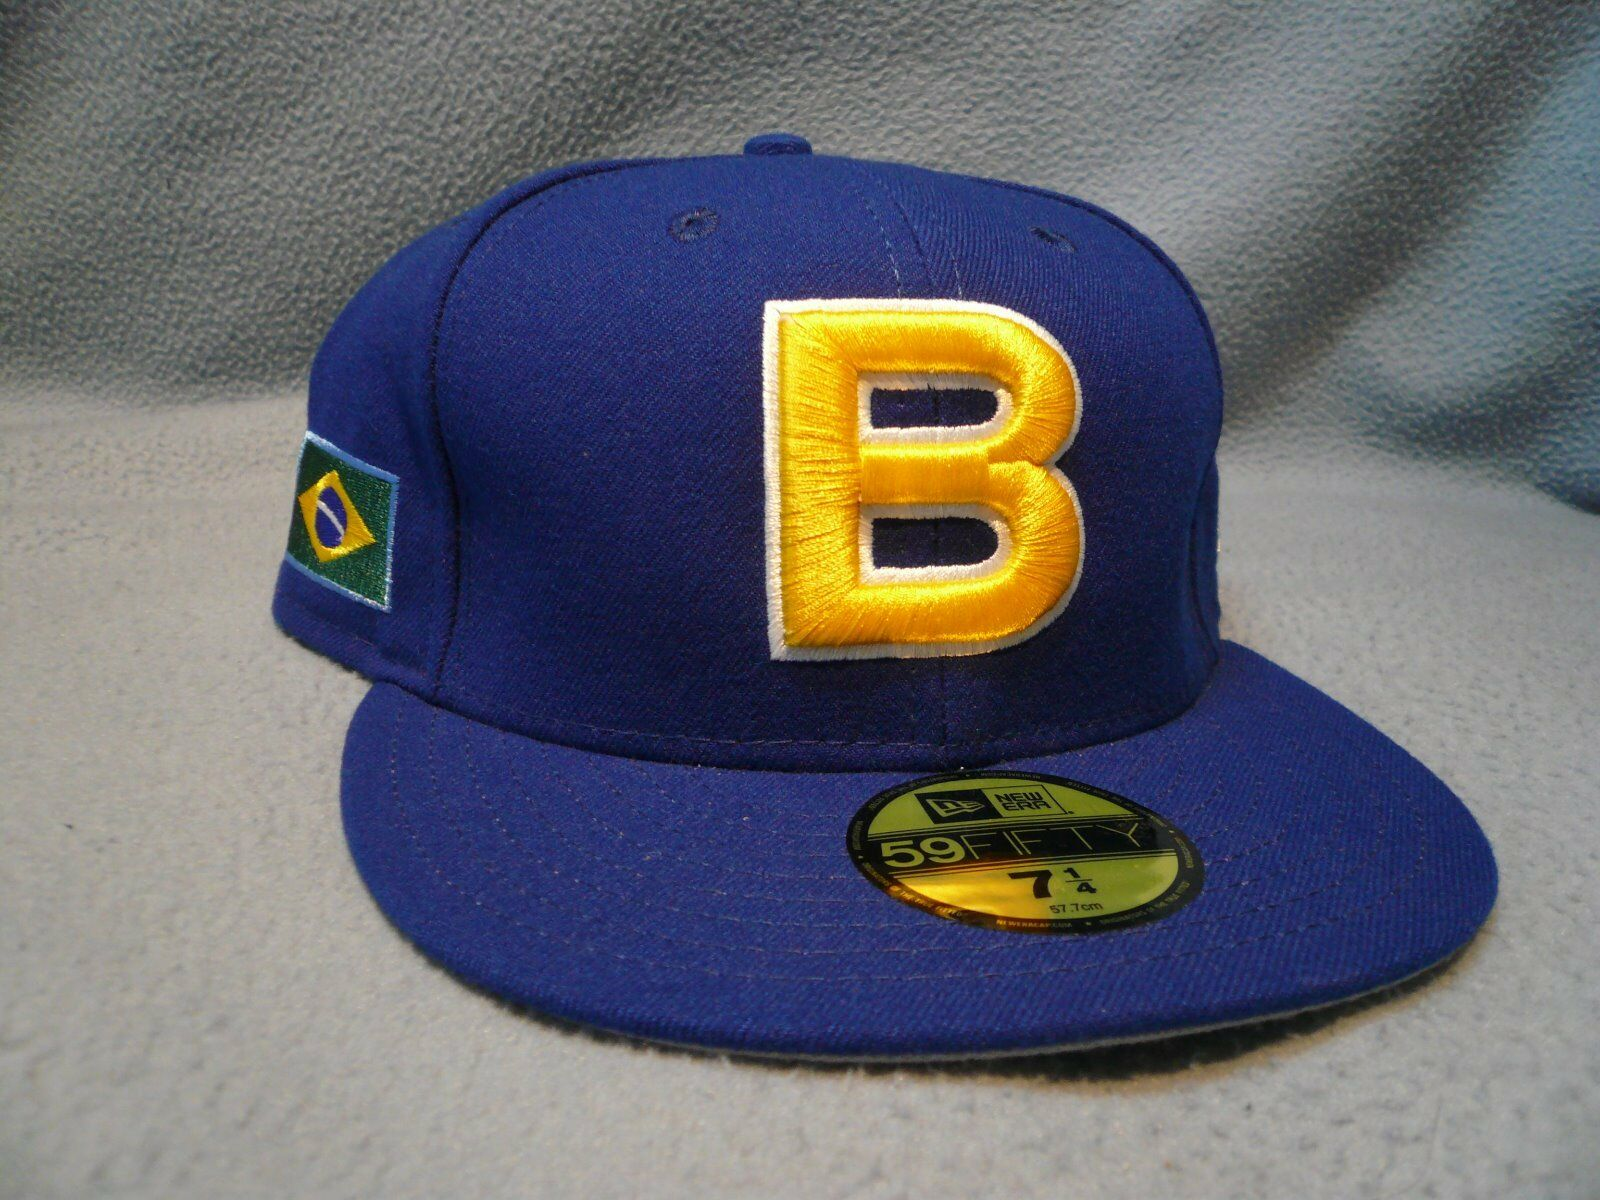 New Era 59Fifty Brazil World Baseball Classic Men Women Royal Blue Fitted hat